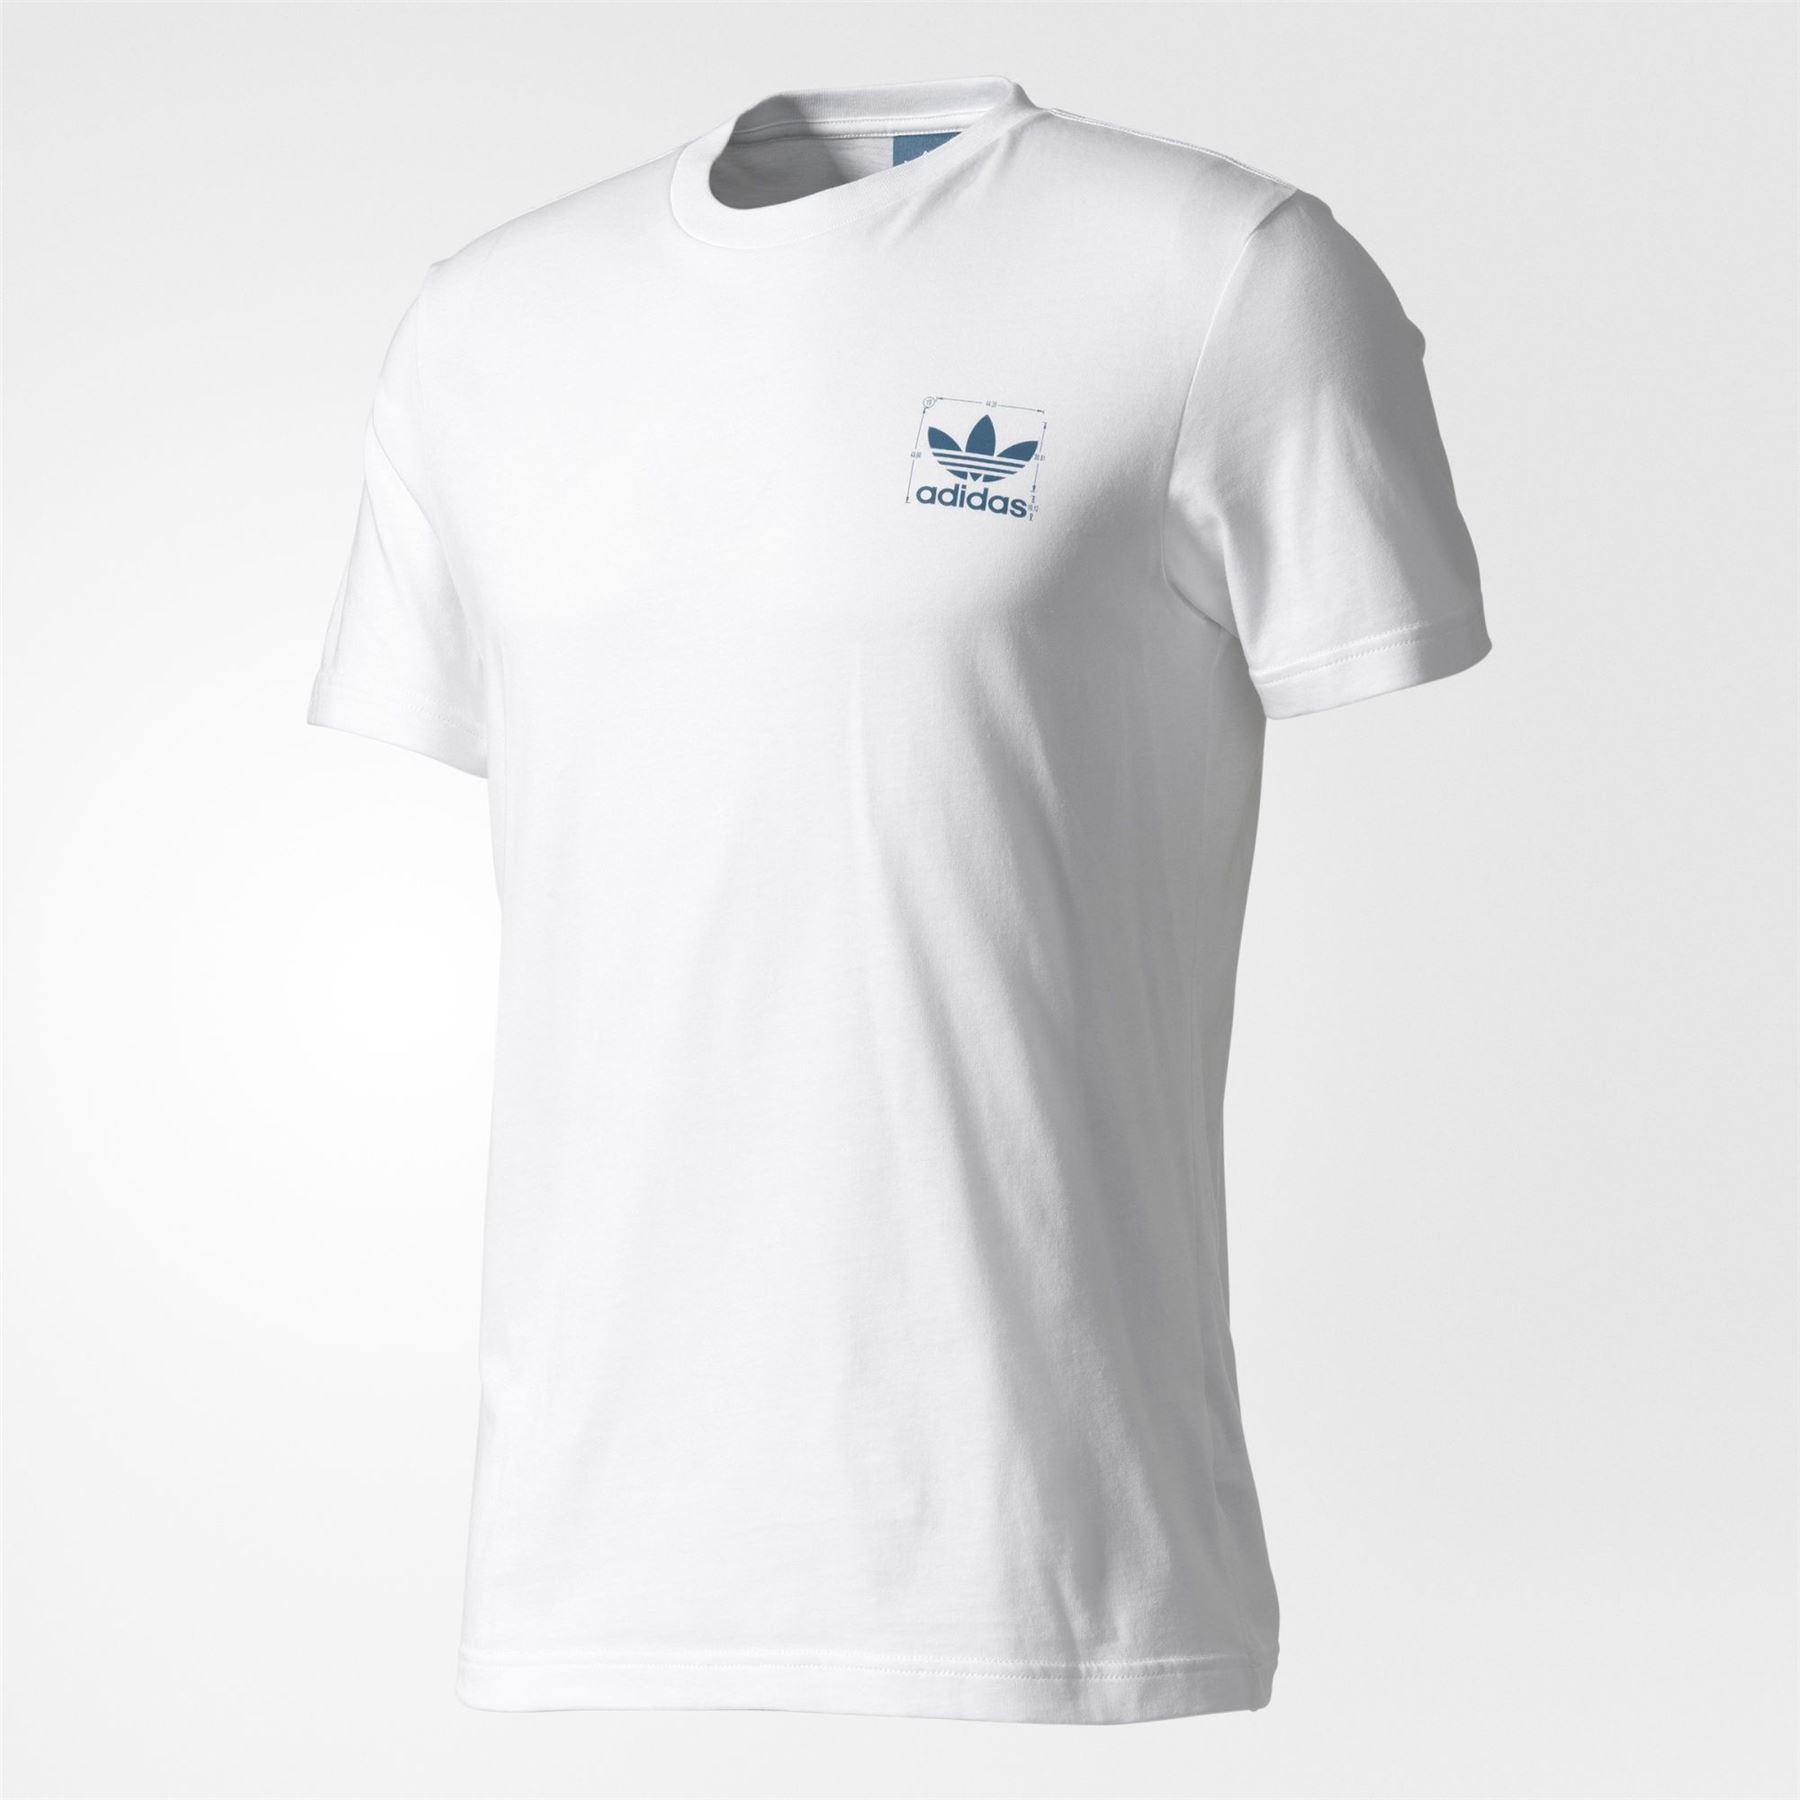 89e995f81018ea Details about adidas ORIGINALS STANDARD T SHIRT WHITE TREFOIL TEE TOP  SUMMER MEN S COTTON NEW